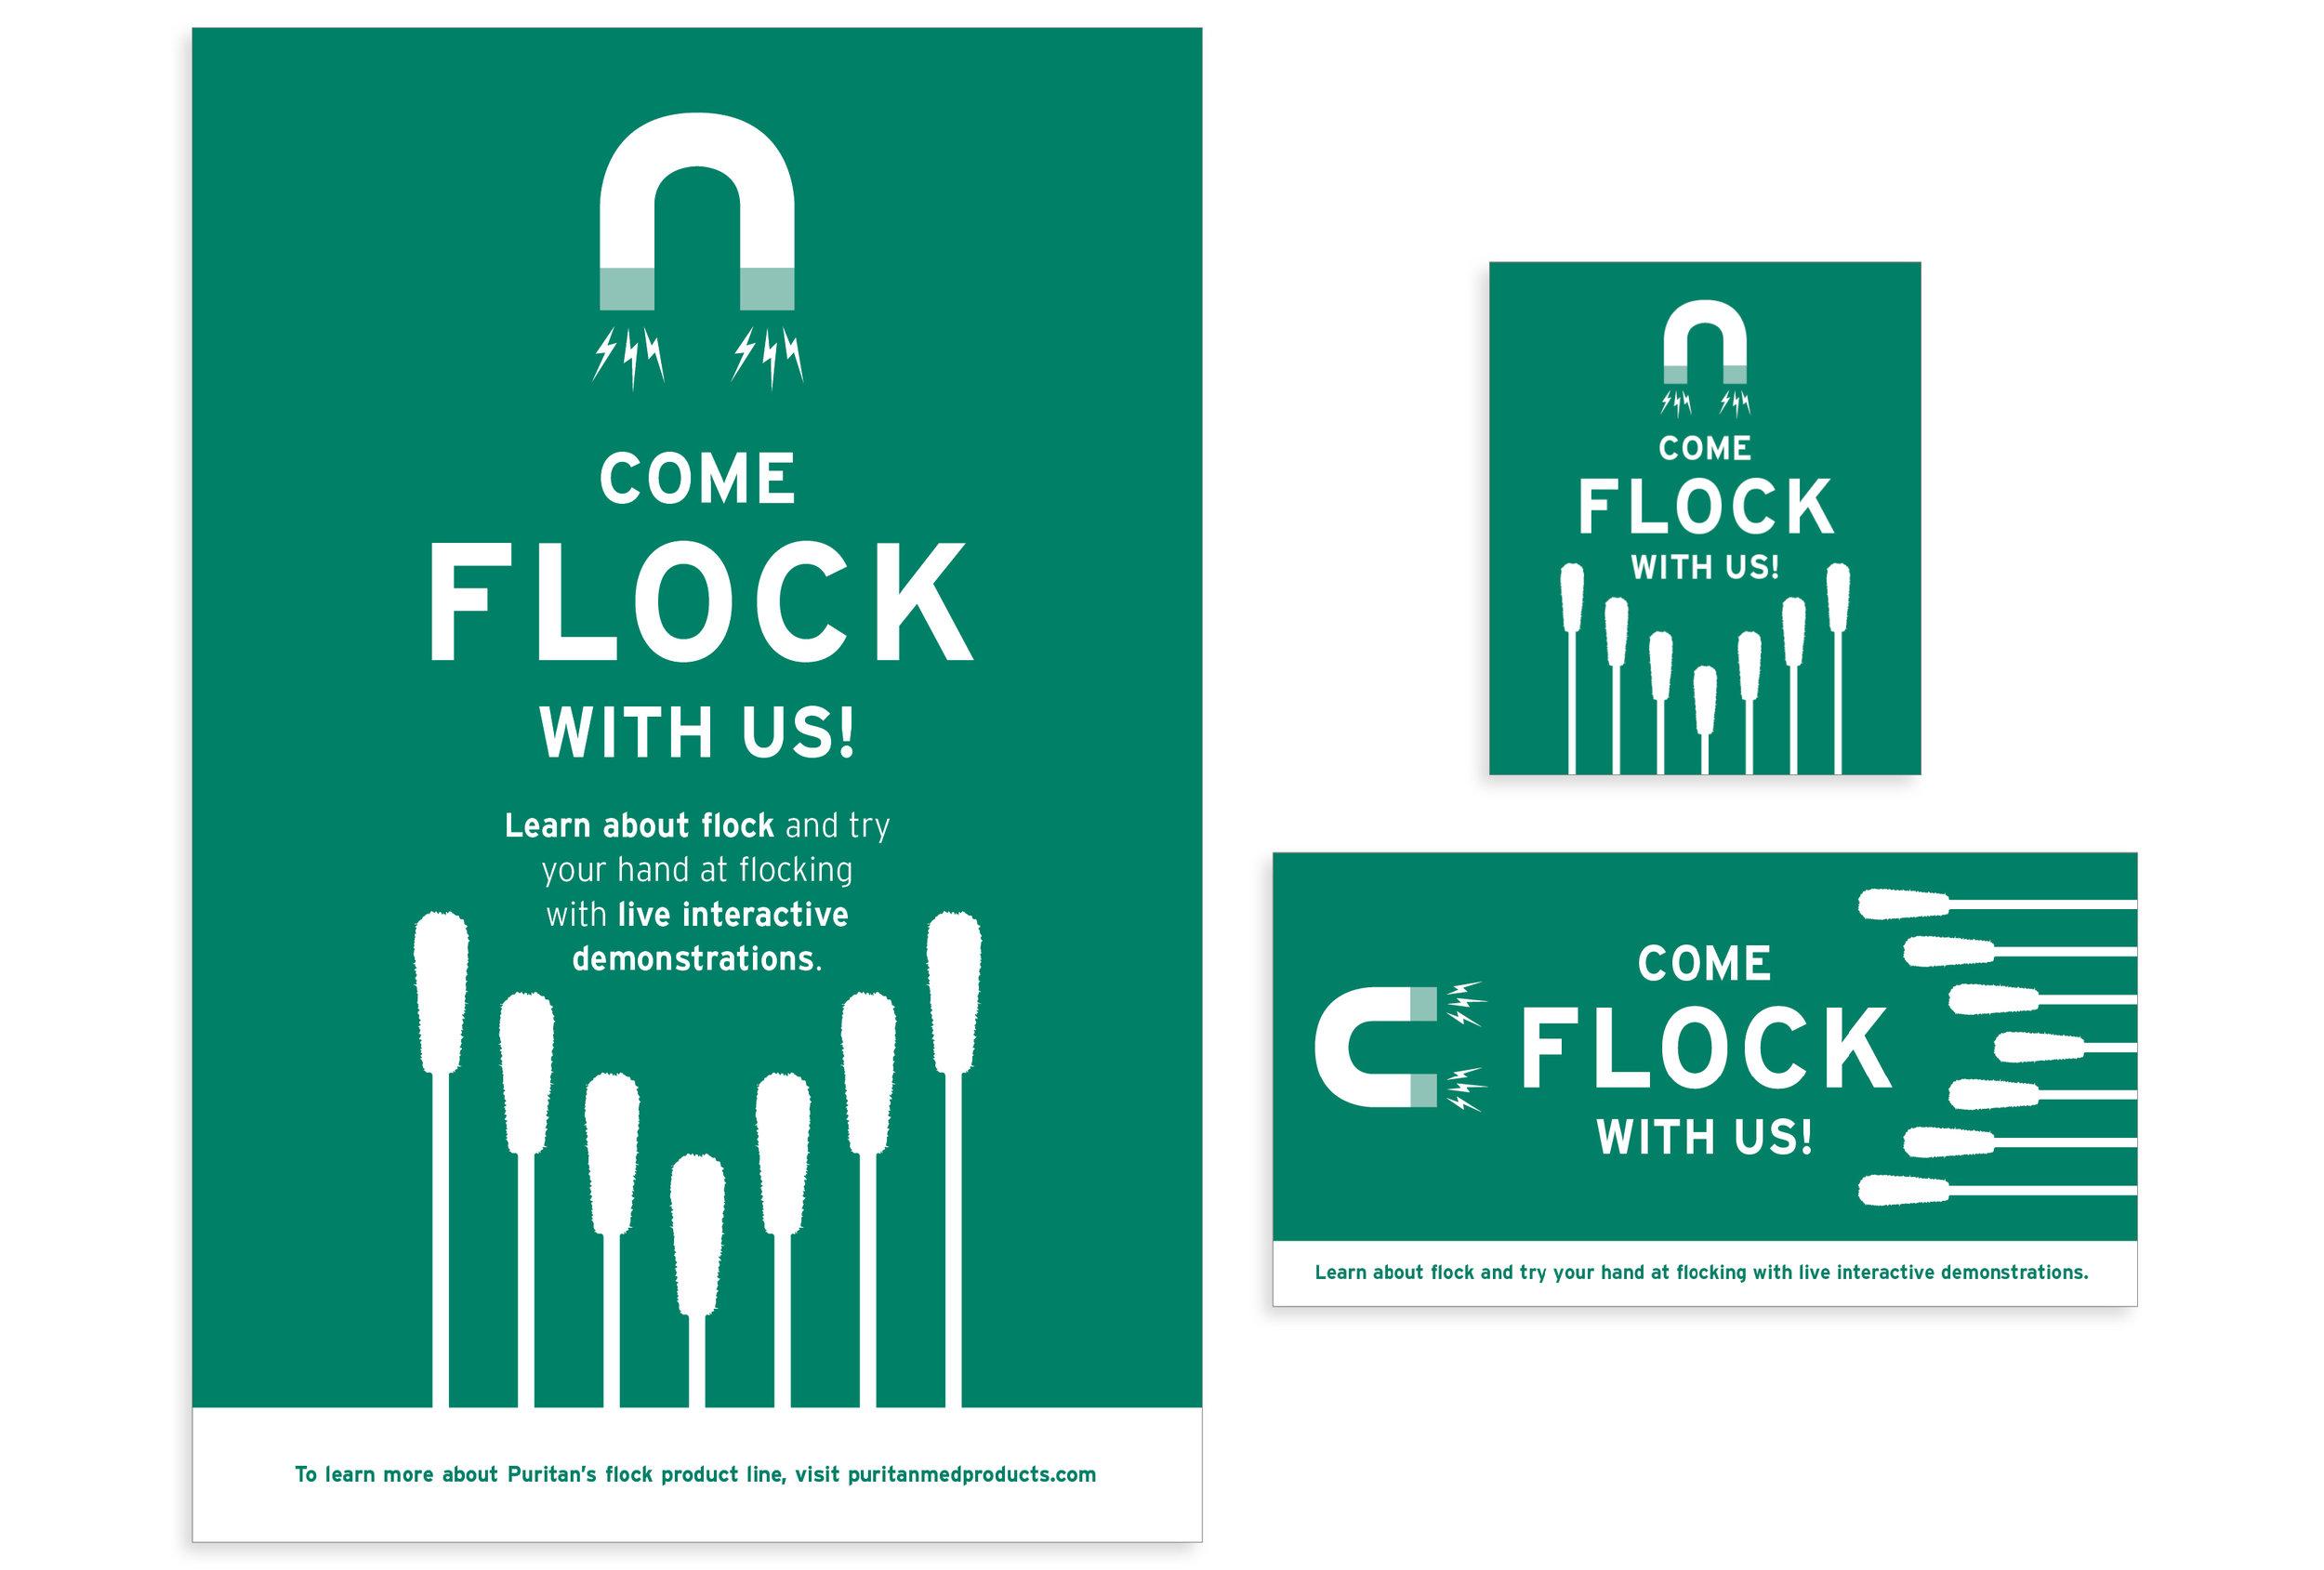 Flock Demo Promotions